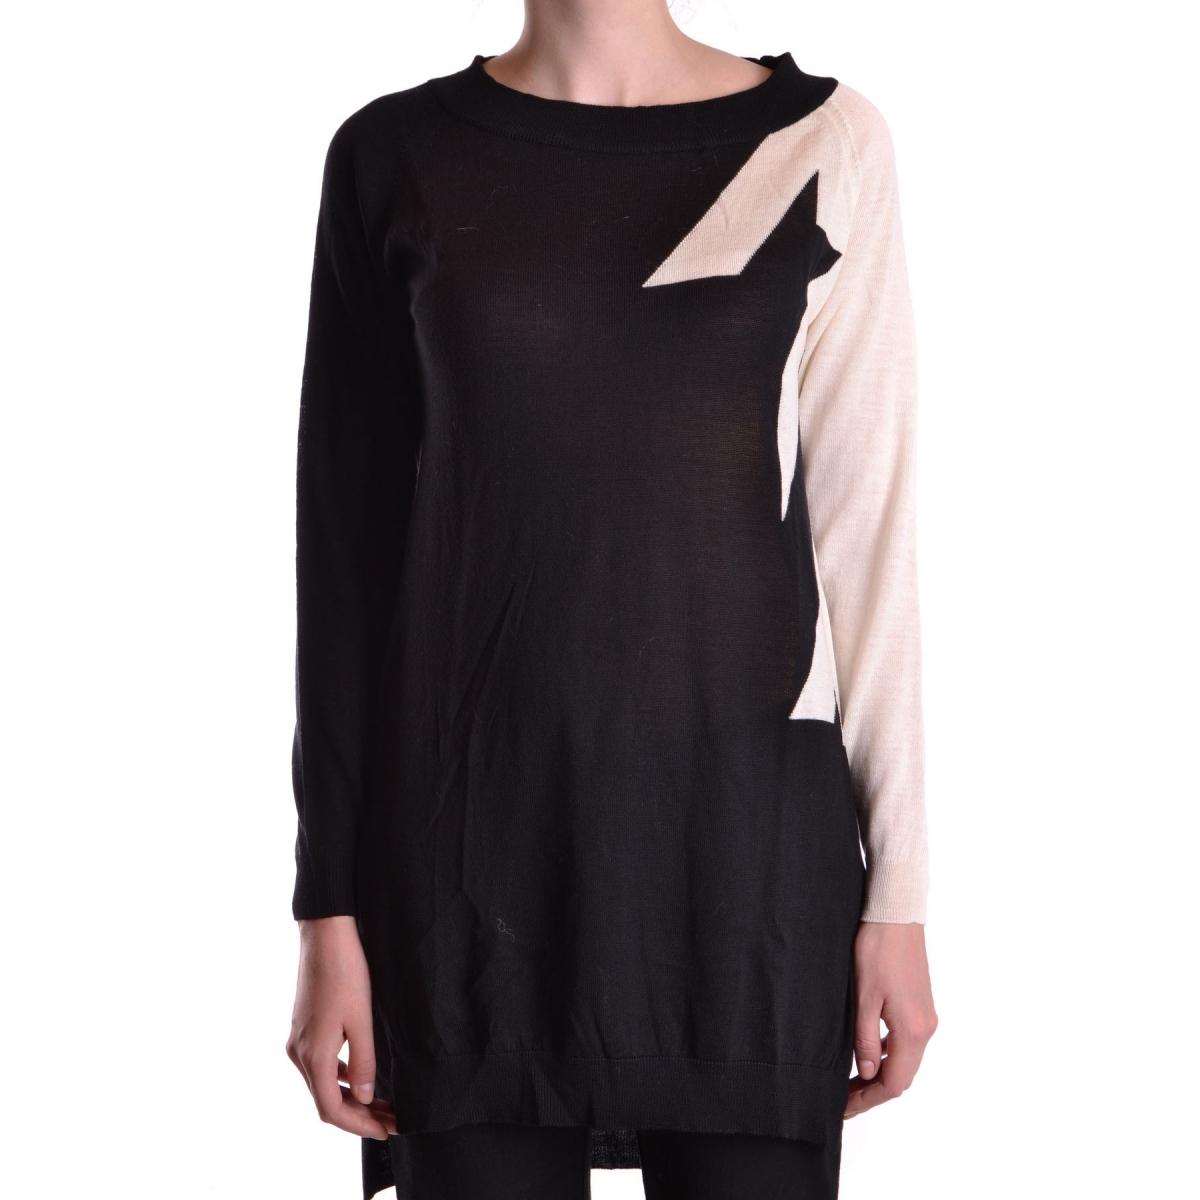 T-Shirt Space PR952 18278IT -70%